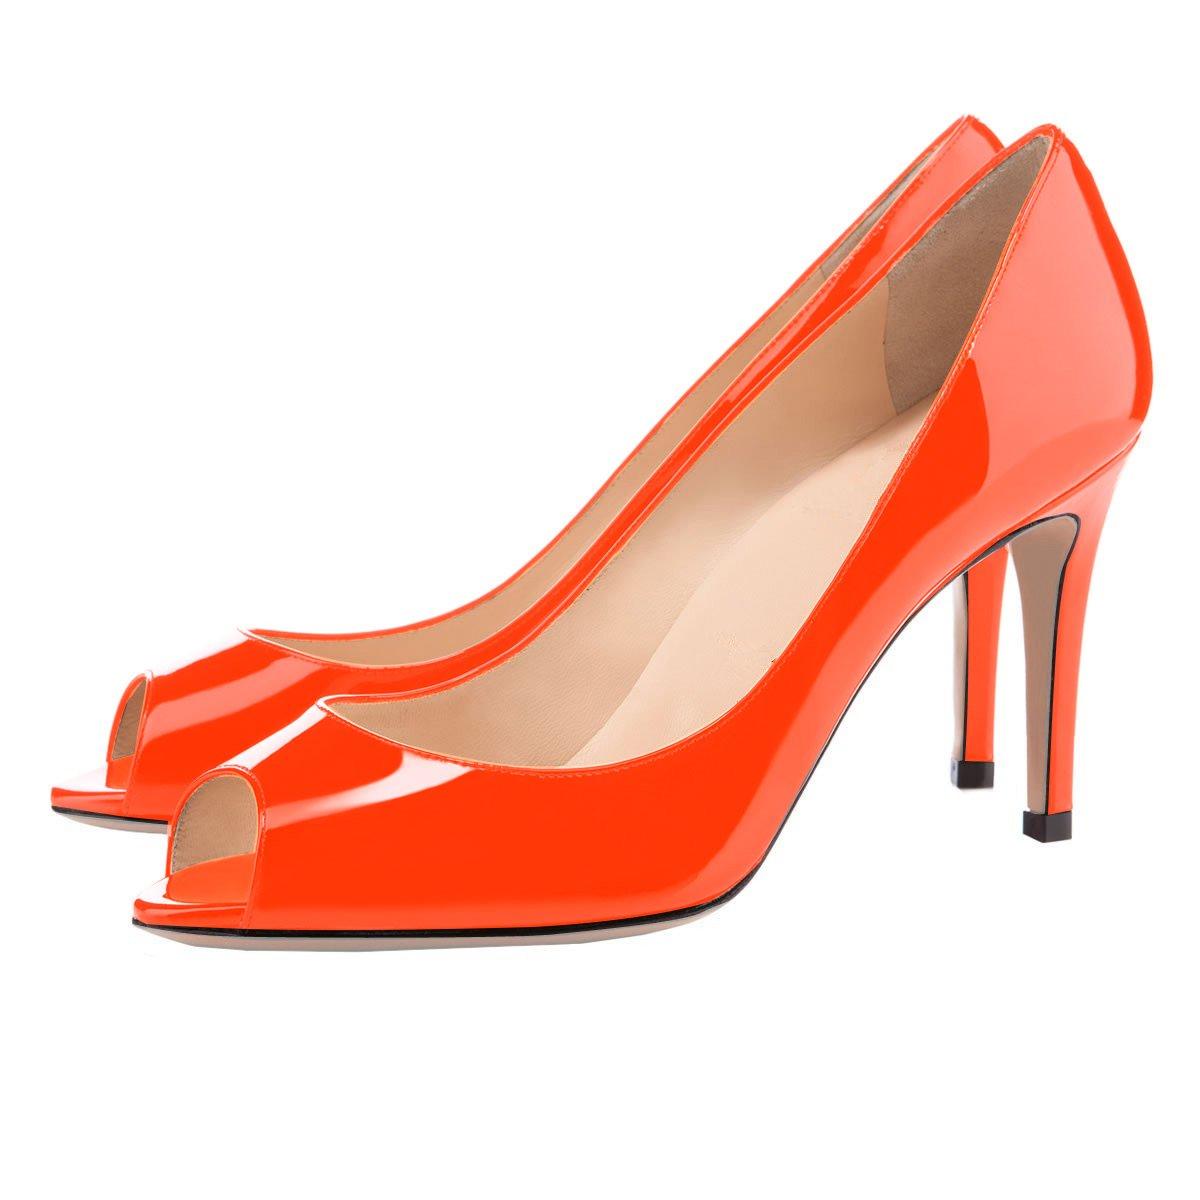 Eldof Women Pumps Peep Toe Pumps Mid-Heel Pumps Women Formal Wedding Bridal Classic Heel Open Toe Stiletto B07F1NBX66 8 B(M) US|Orange a20b10